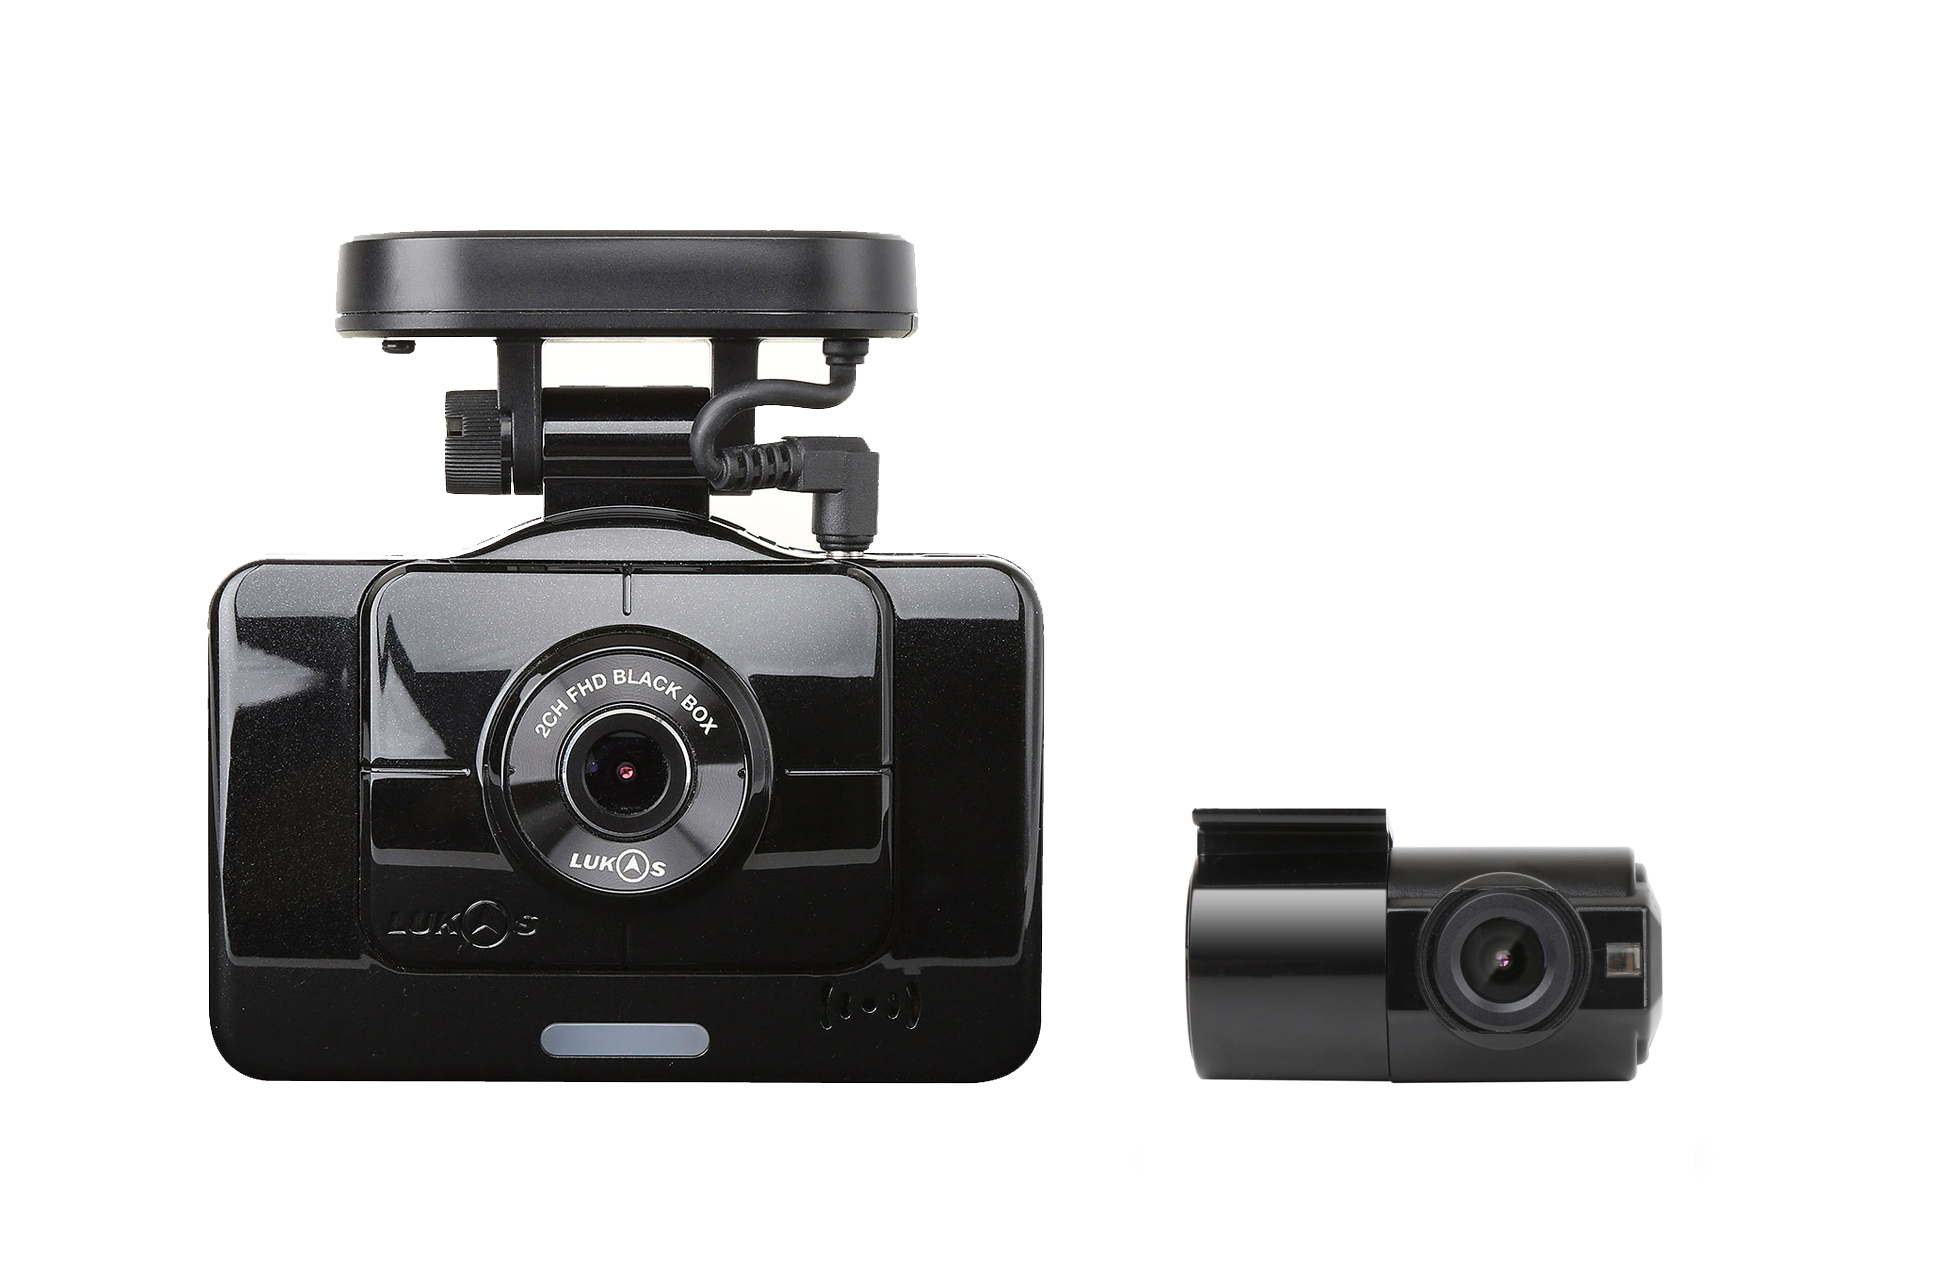 qvia lukas rh qviadashcam net Sony Professional Camcorders Panasonic Camcorder Accessories